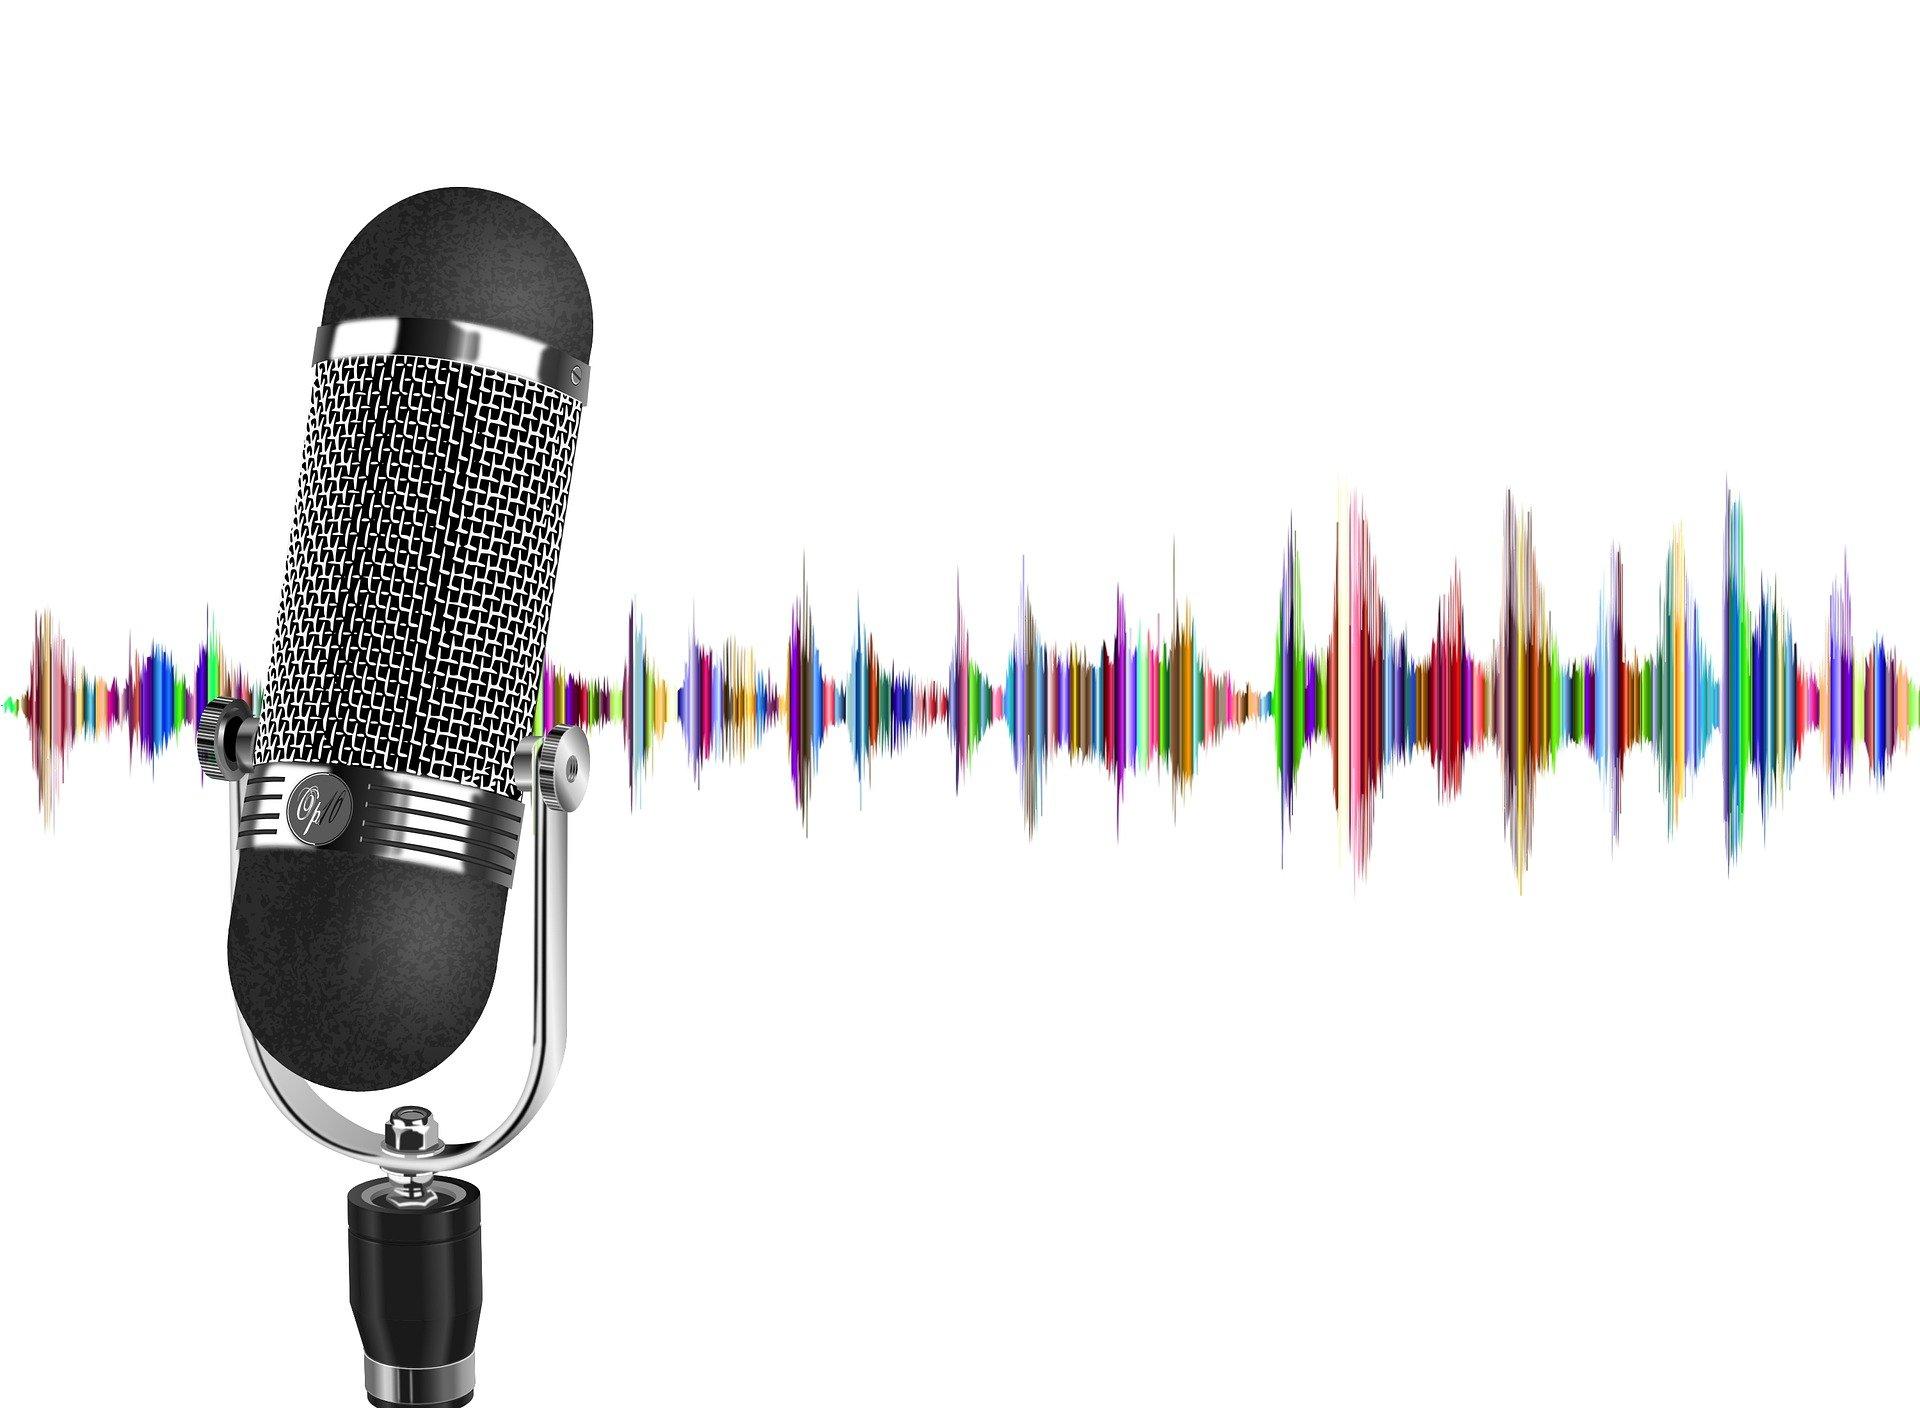 podcast-4209770_1920